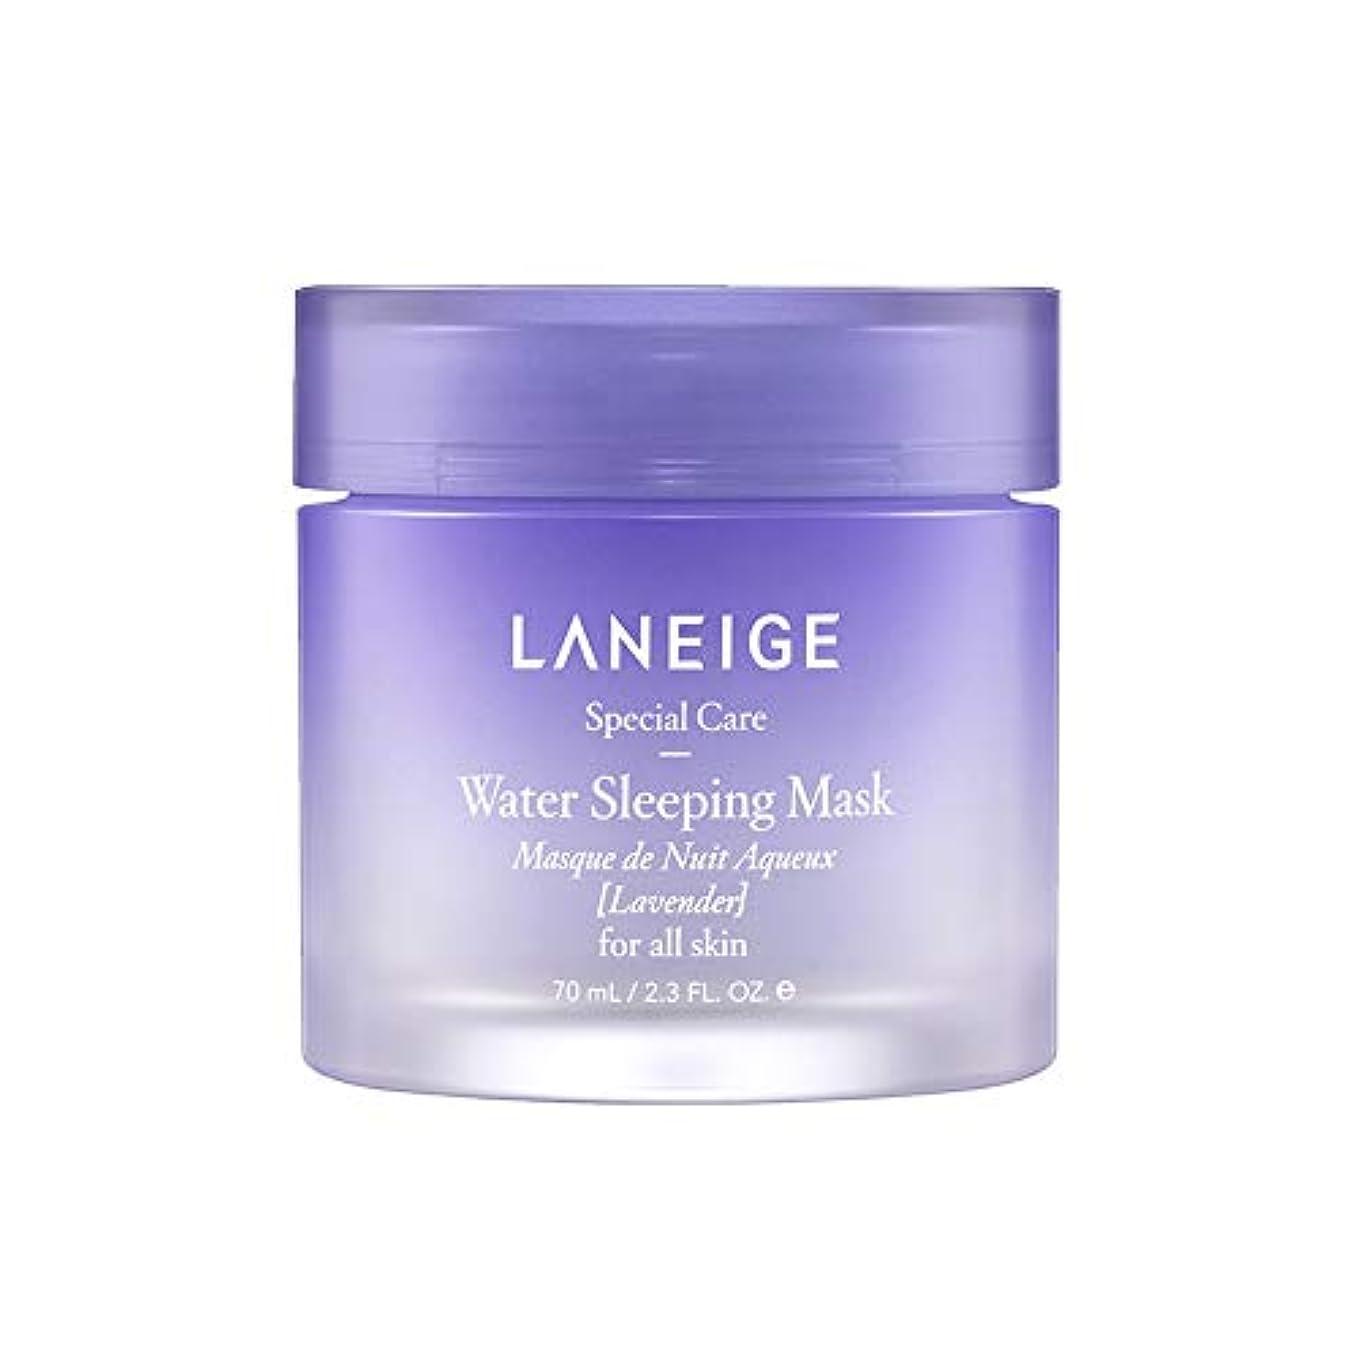 Water Sleeping Mask [Lavender] 70ml/ウォーター スリーピング マスク [ラベンダー] 70ml